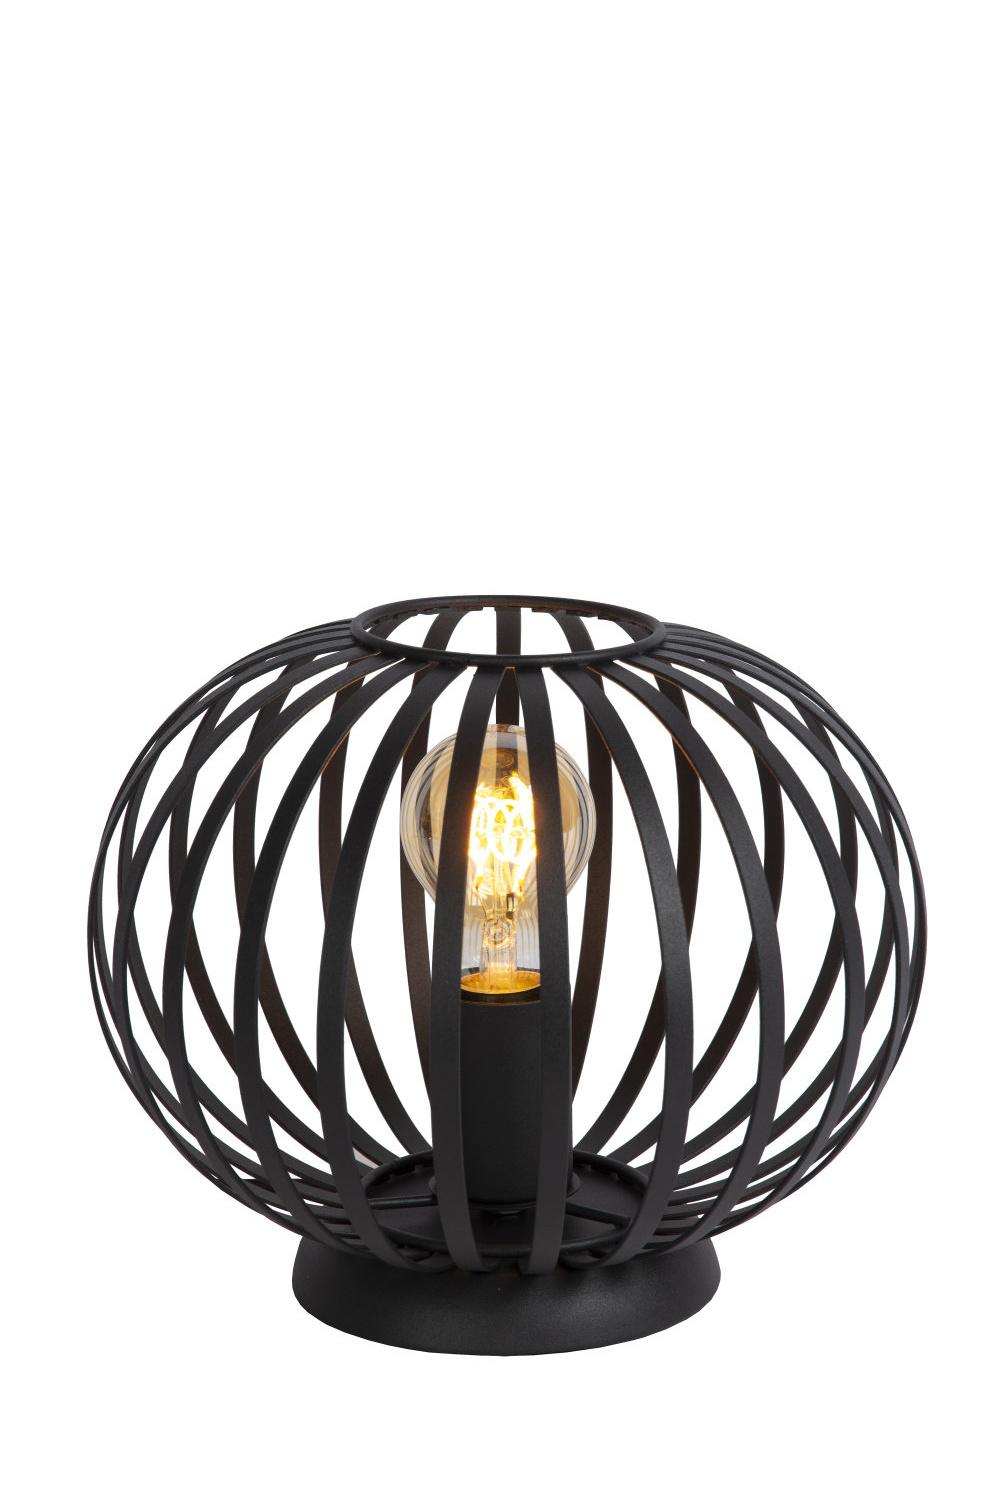 Lucide MANUELA Tafellamp-Zwart-Ø25,5-1xE27-40W-Metaal